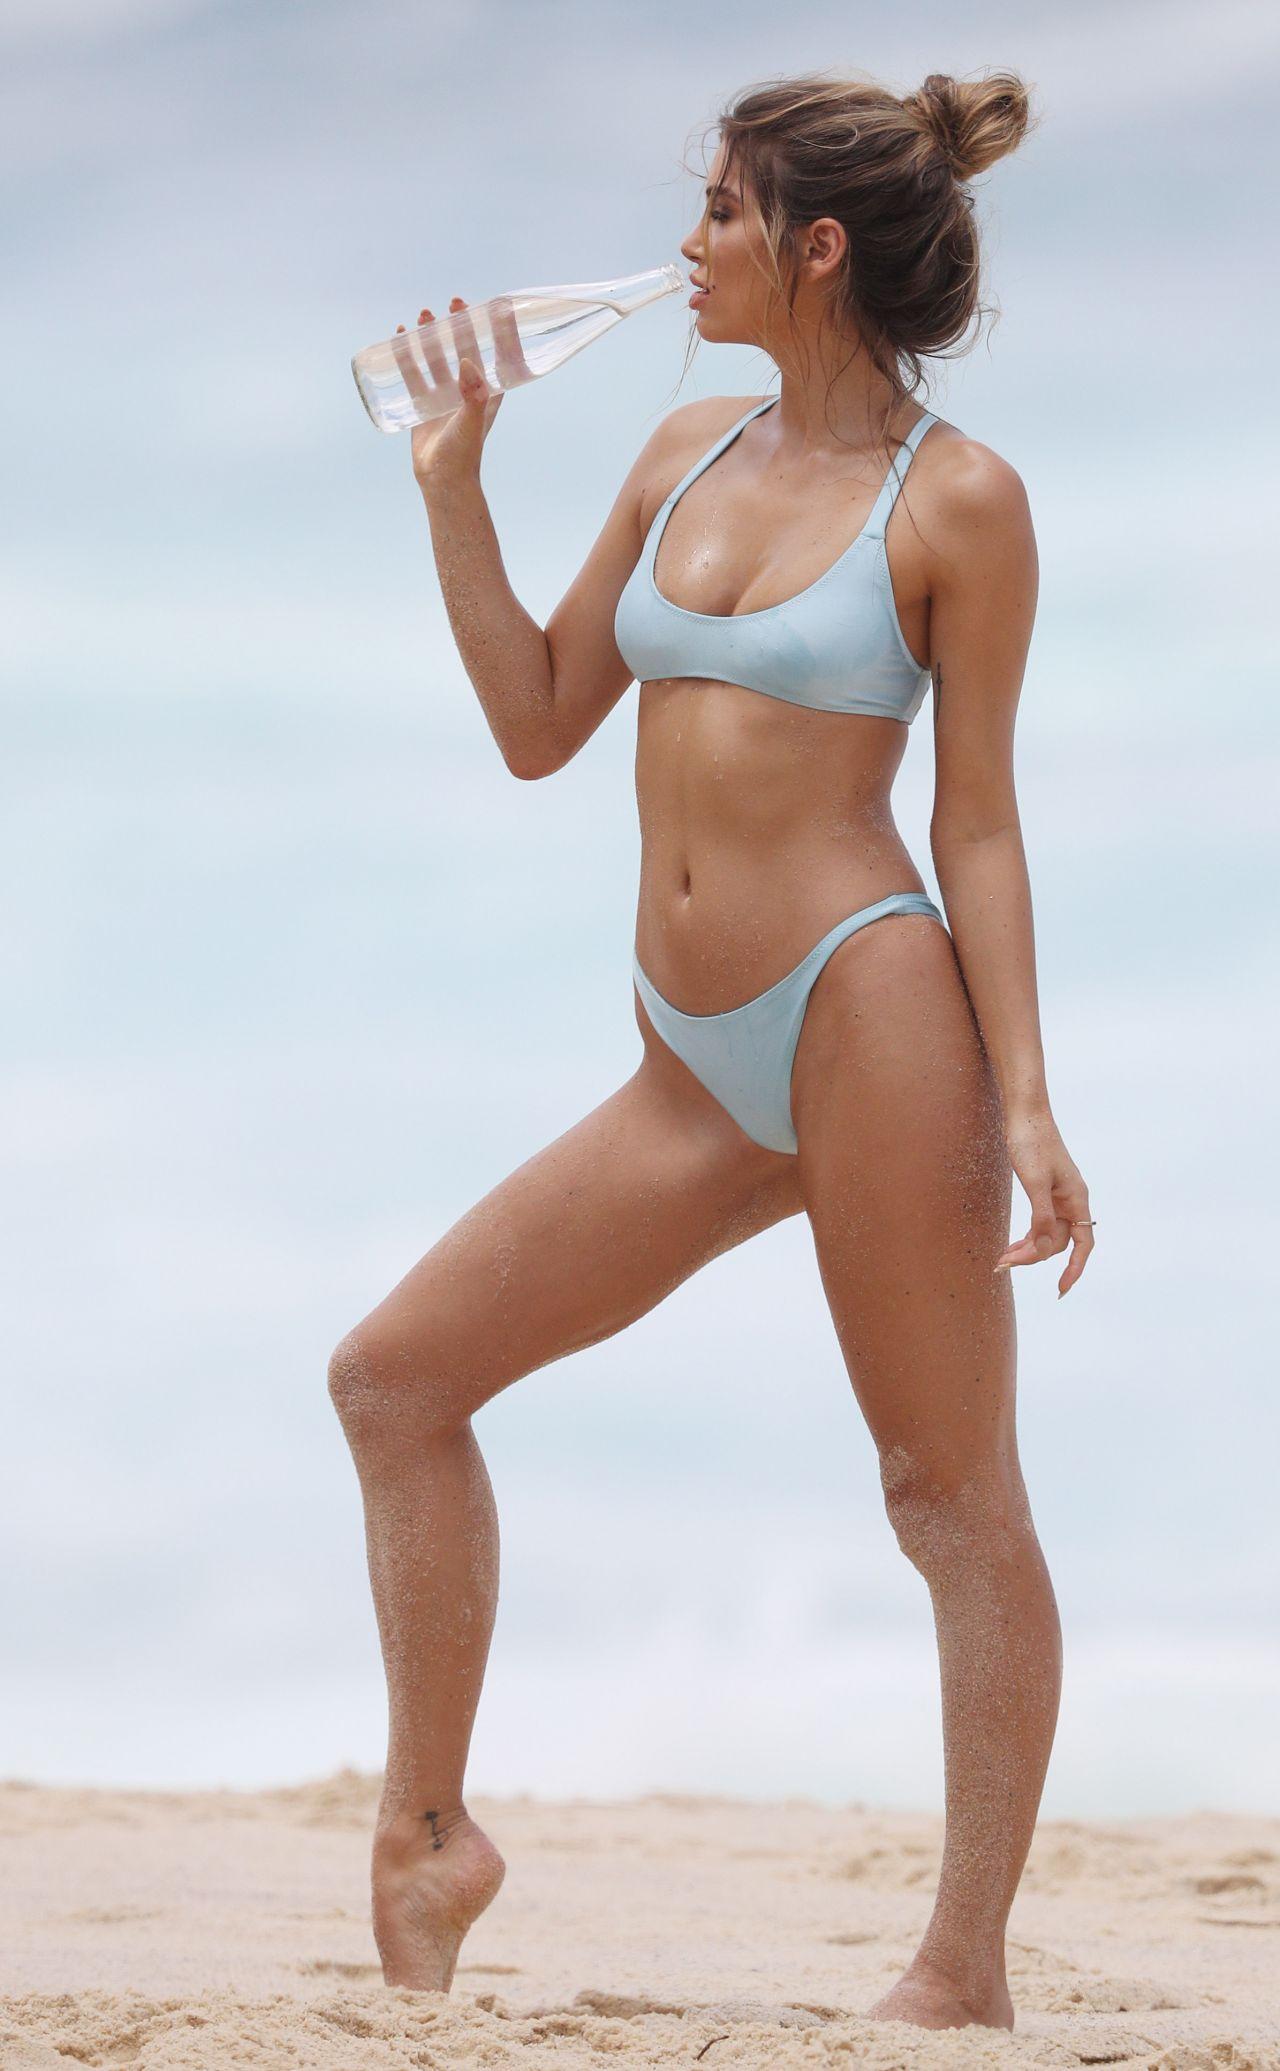 Bella Lucia Bikini Photoshoot on Bronte Beach Pic 3 of 35